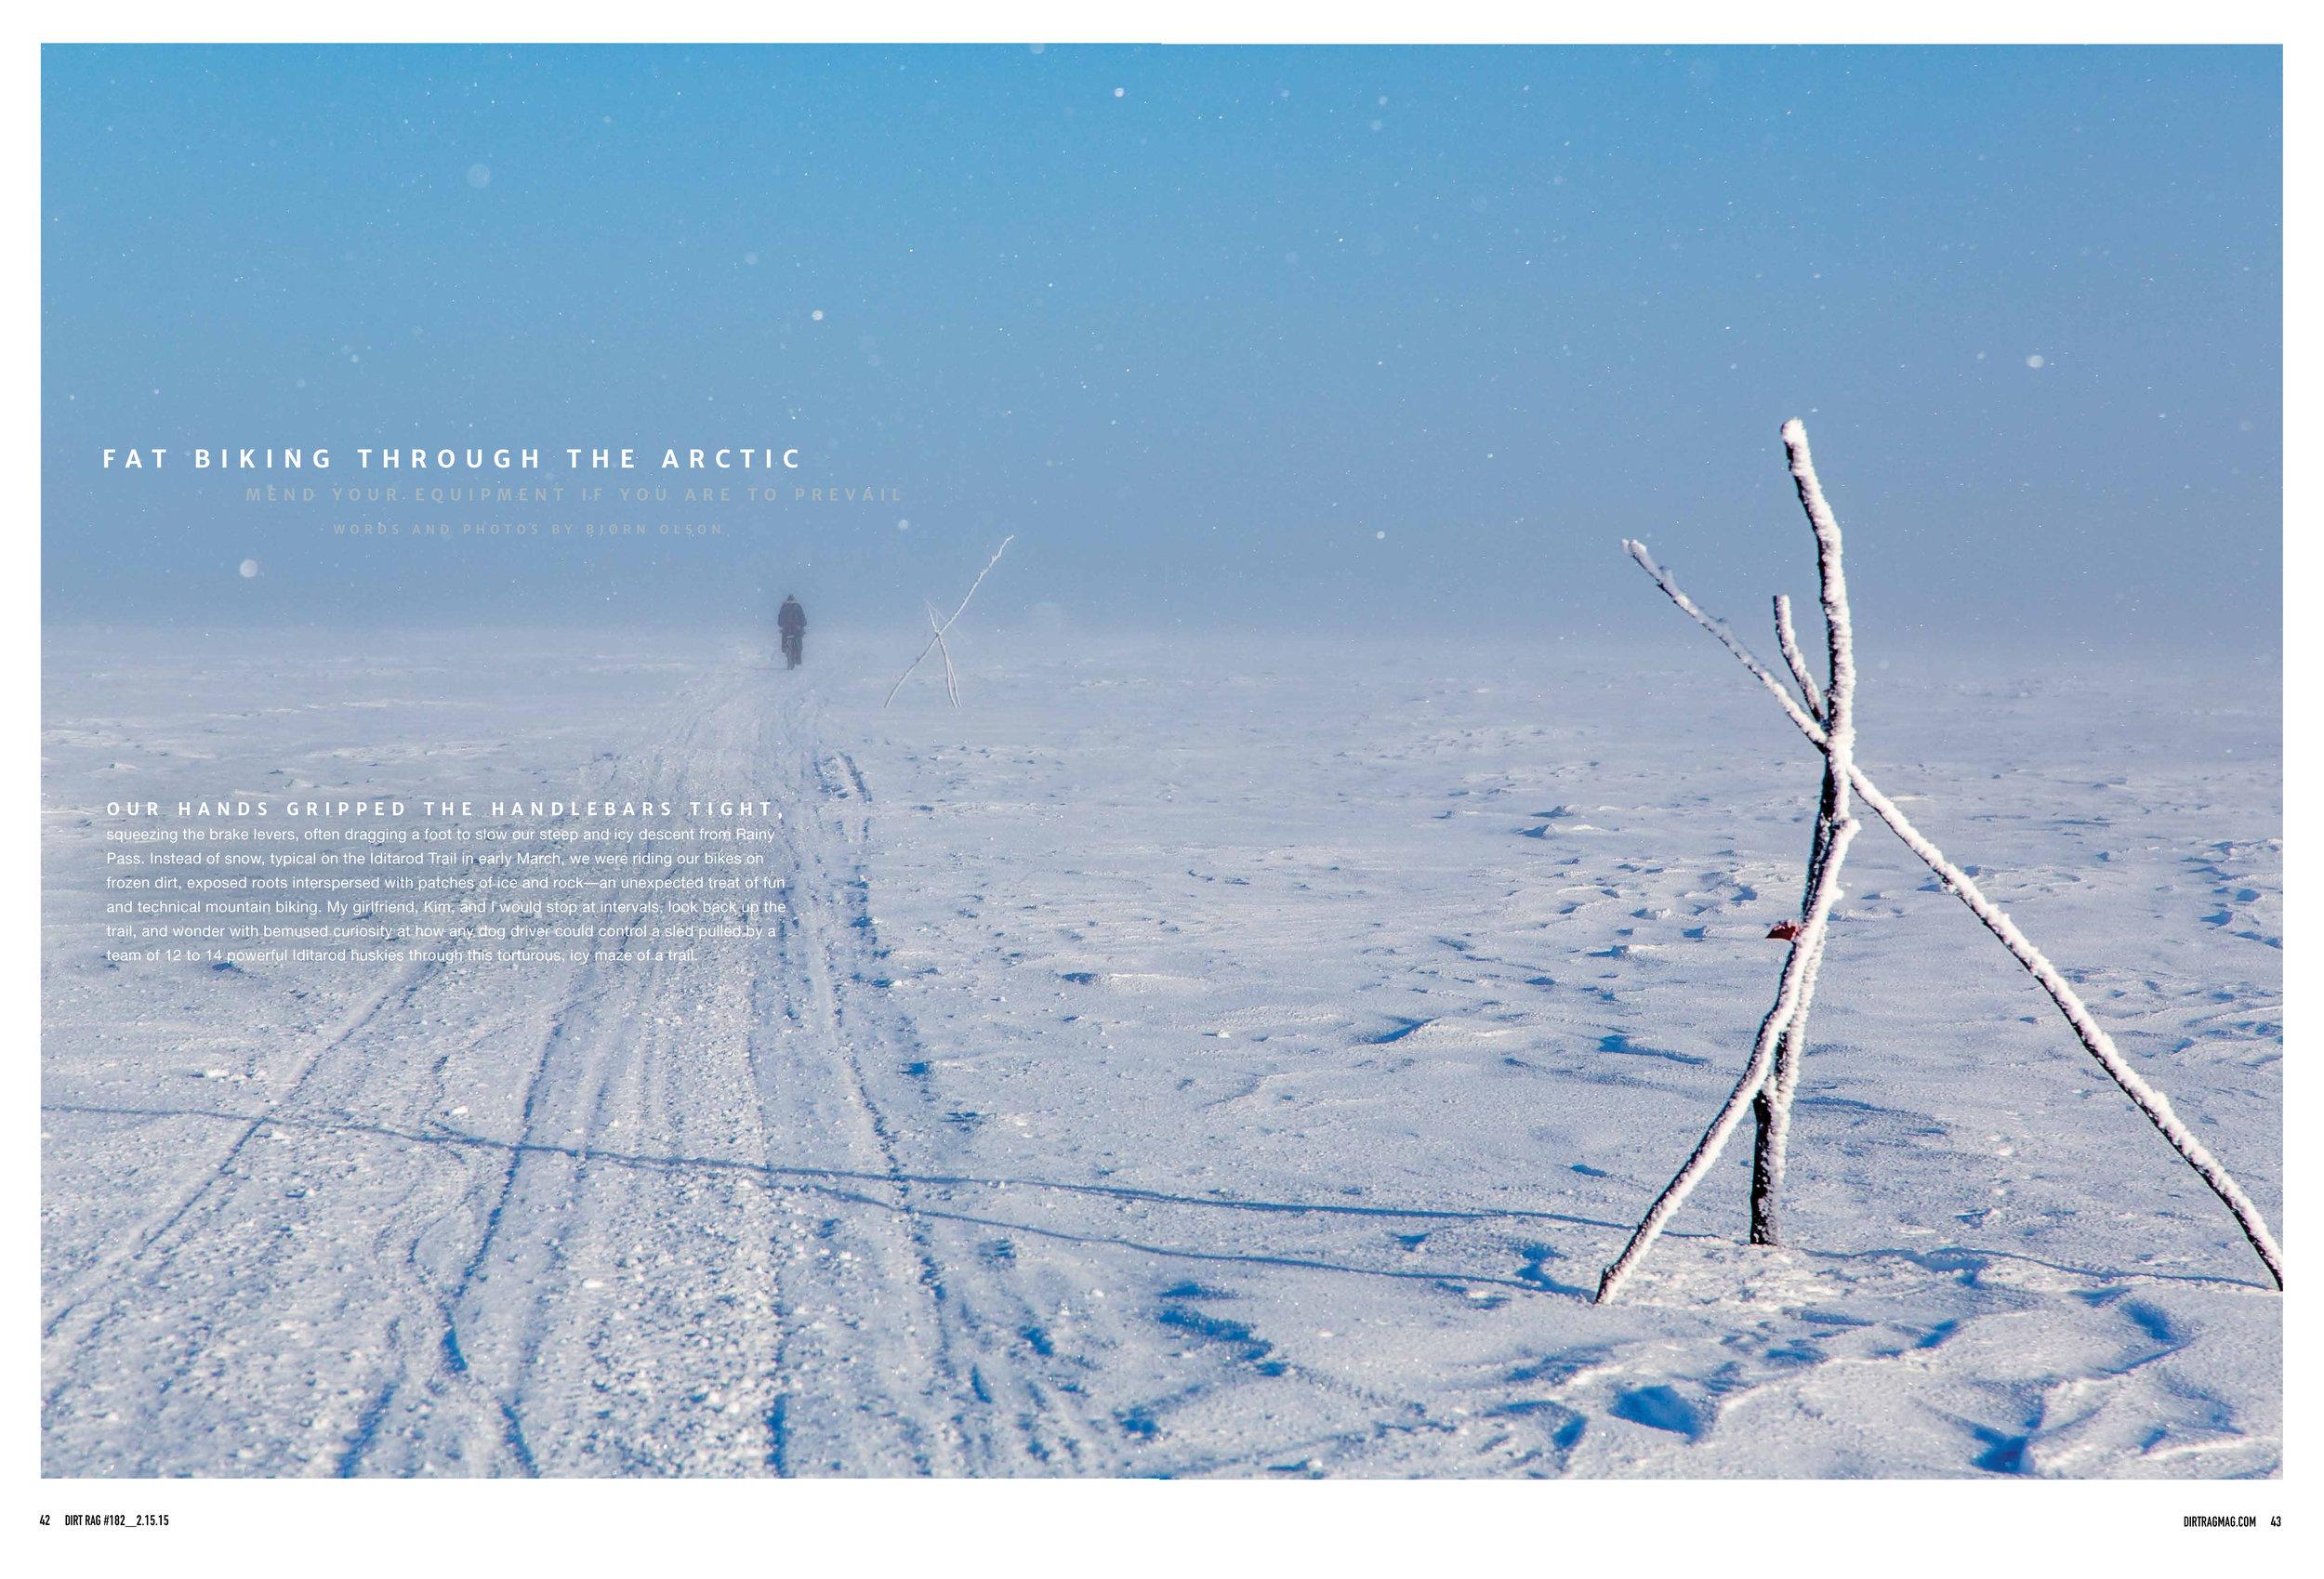 182_Arctic Fatbiking_42_43.jpg